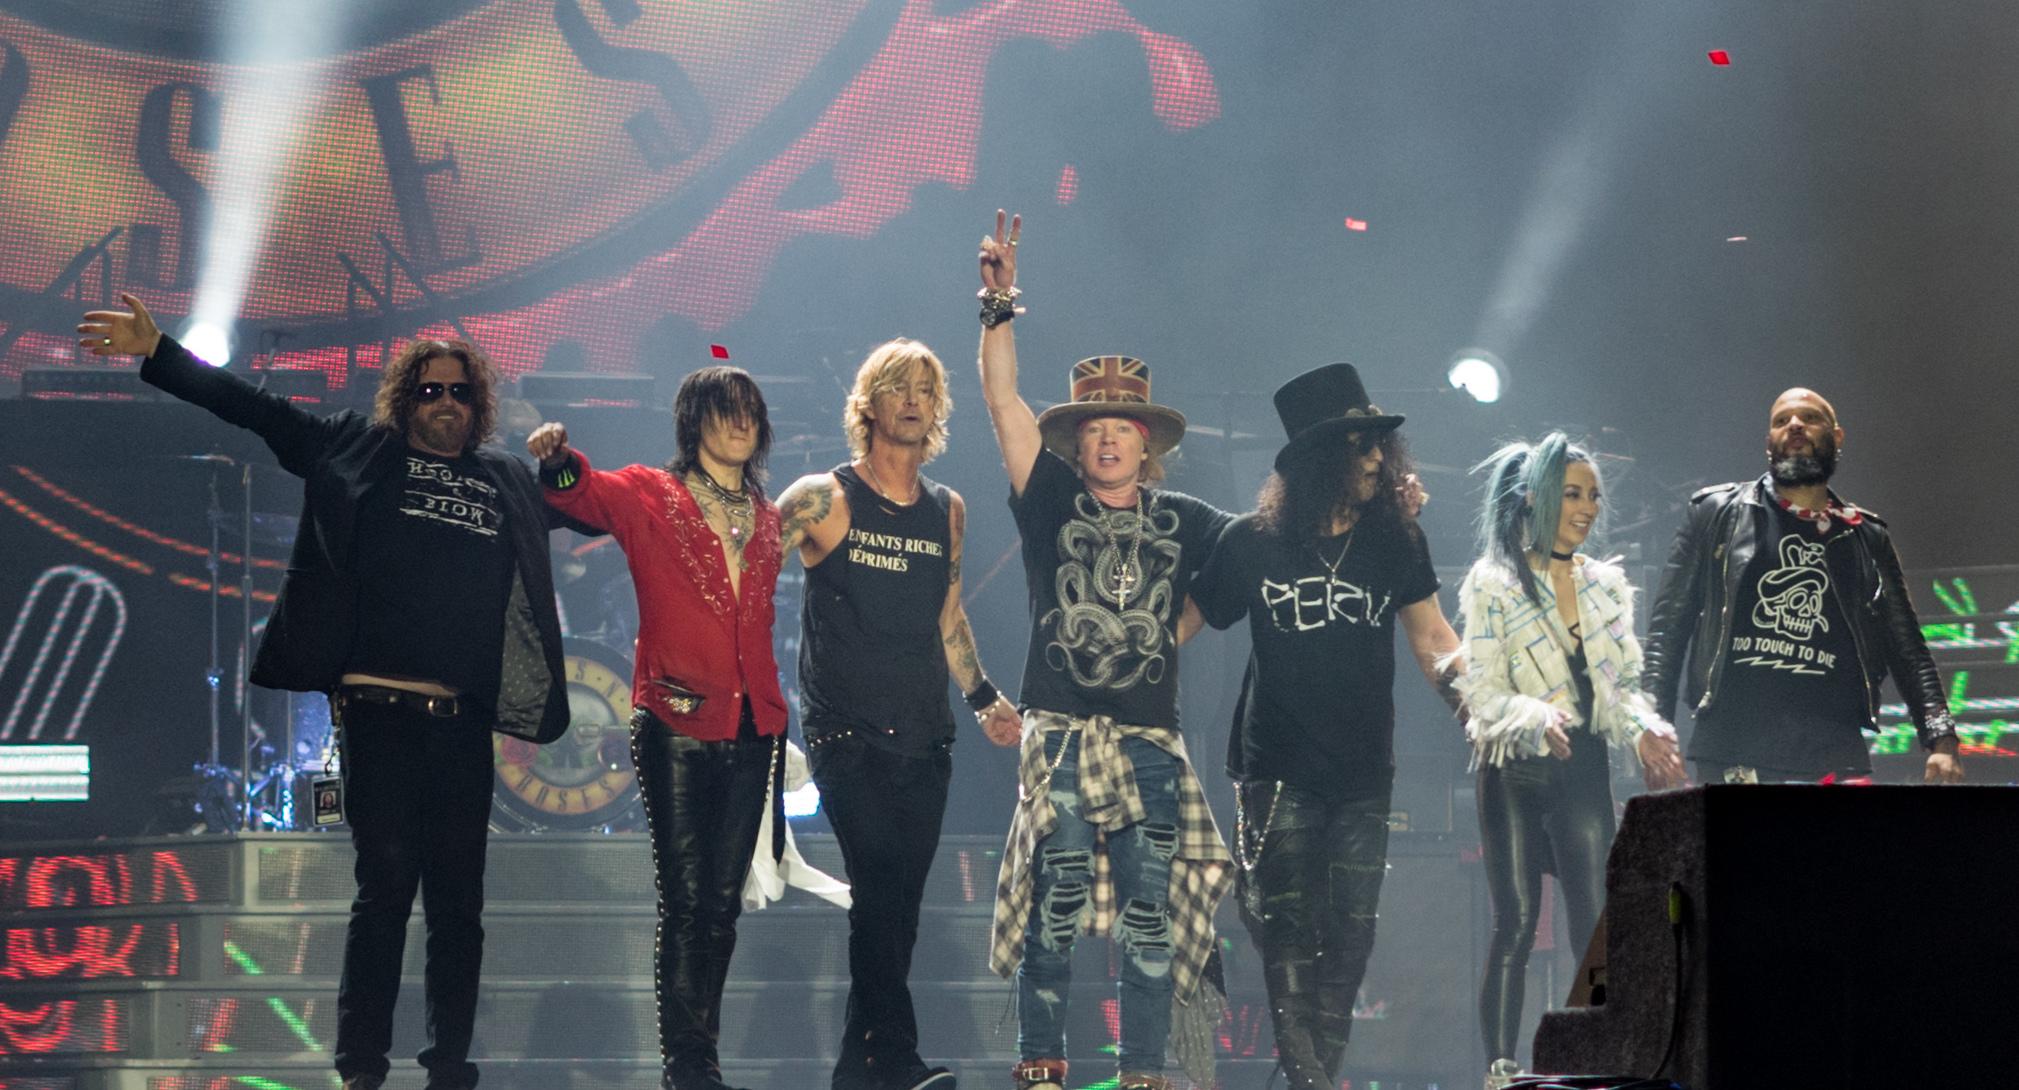 /Limited Edition CD Platinum Disc/ /Appetite For Destruction Century Music Awards Guns N Roses/